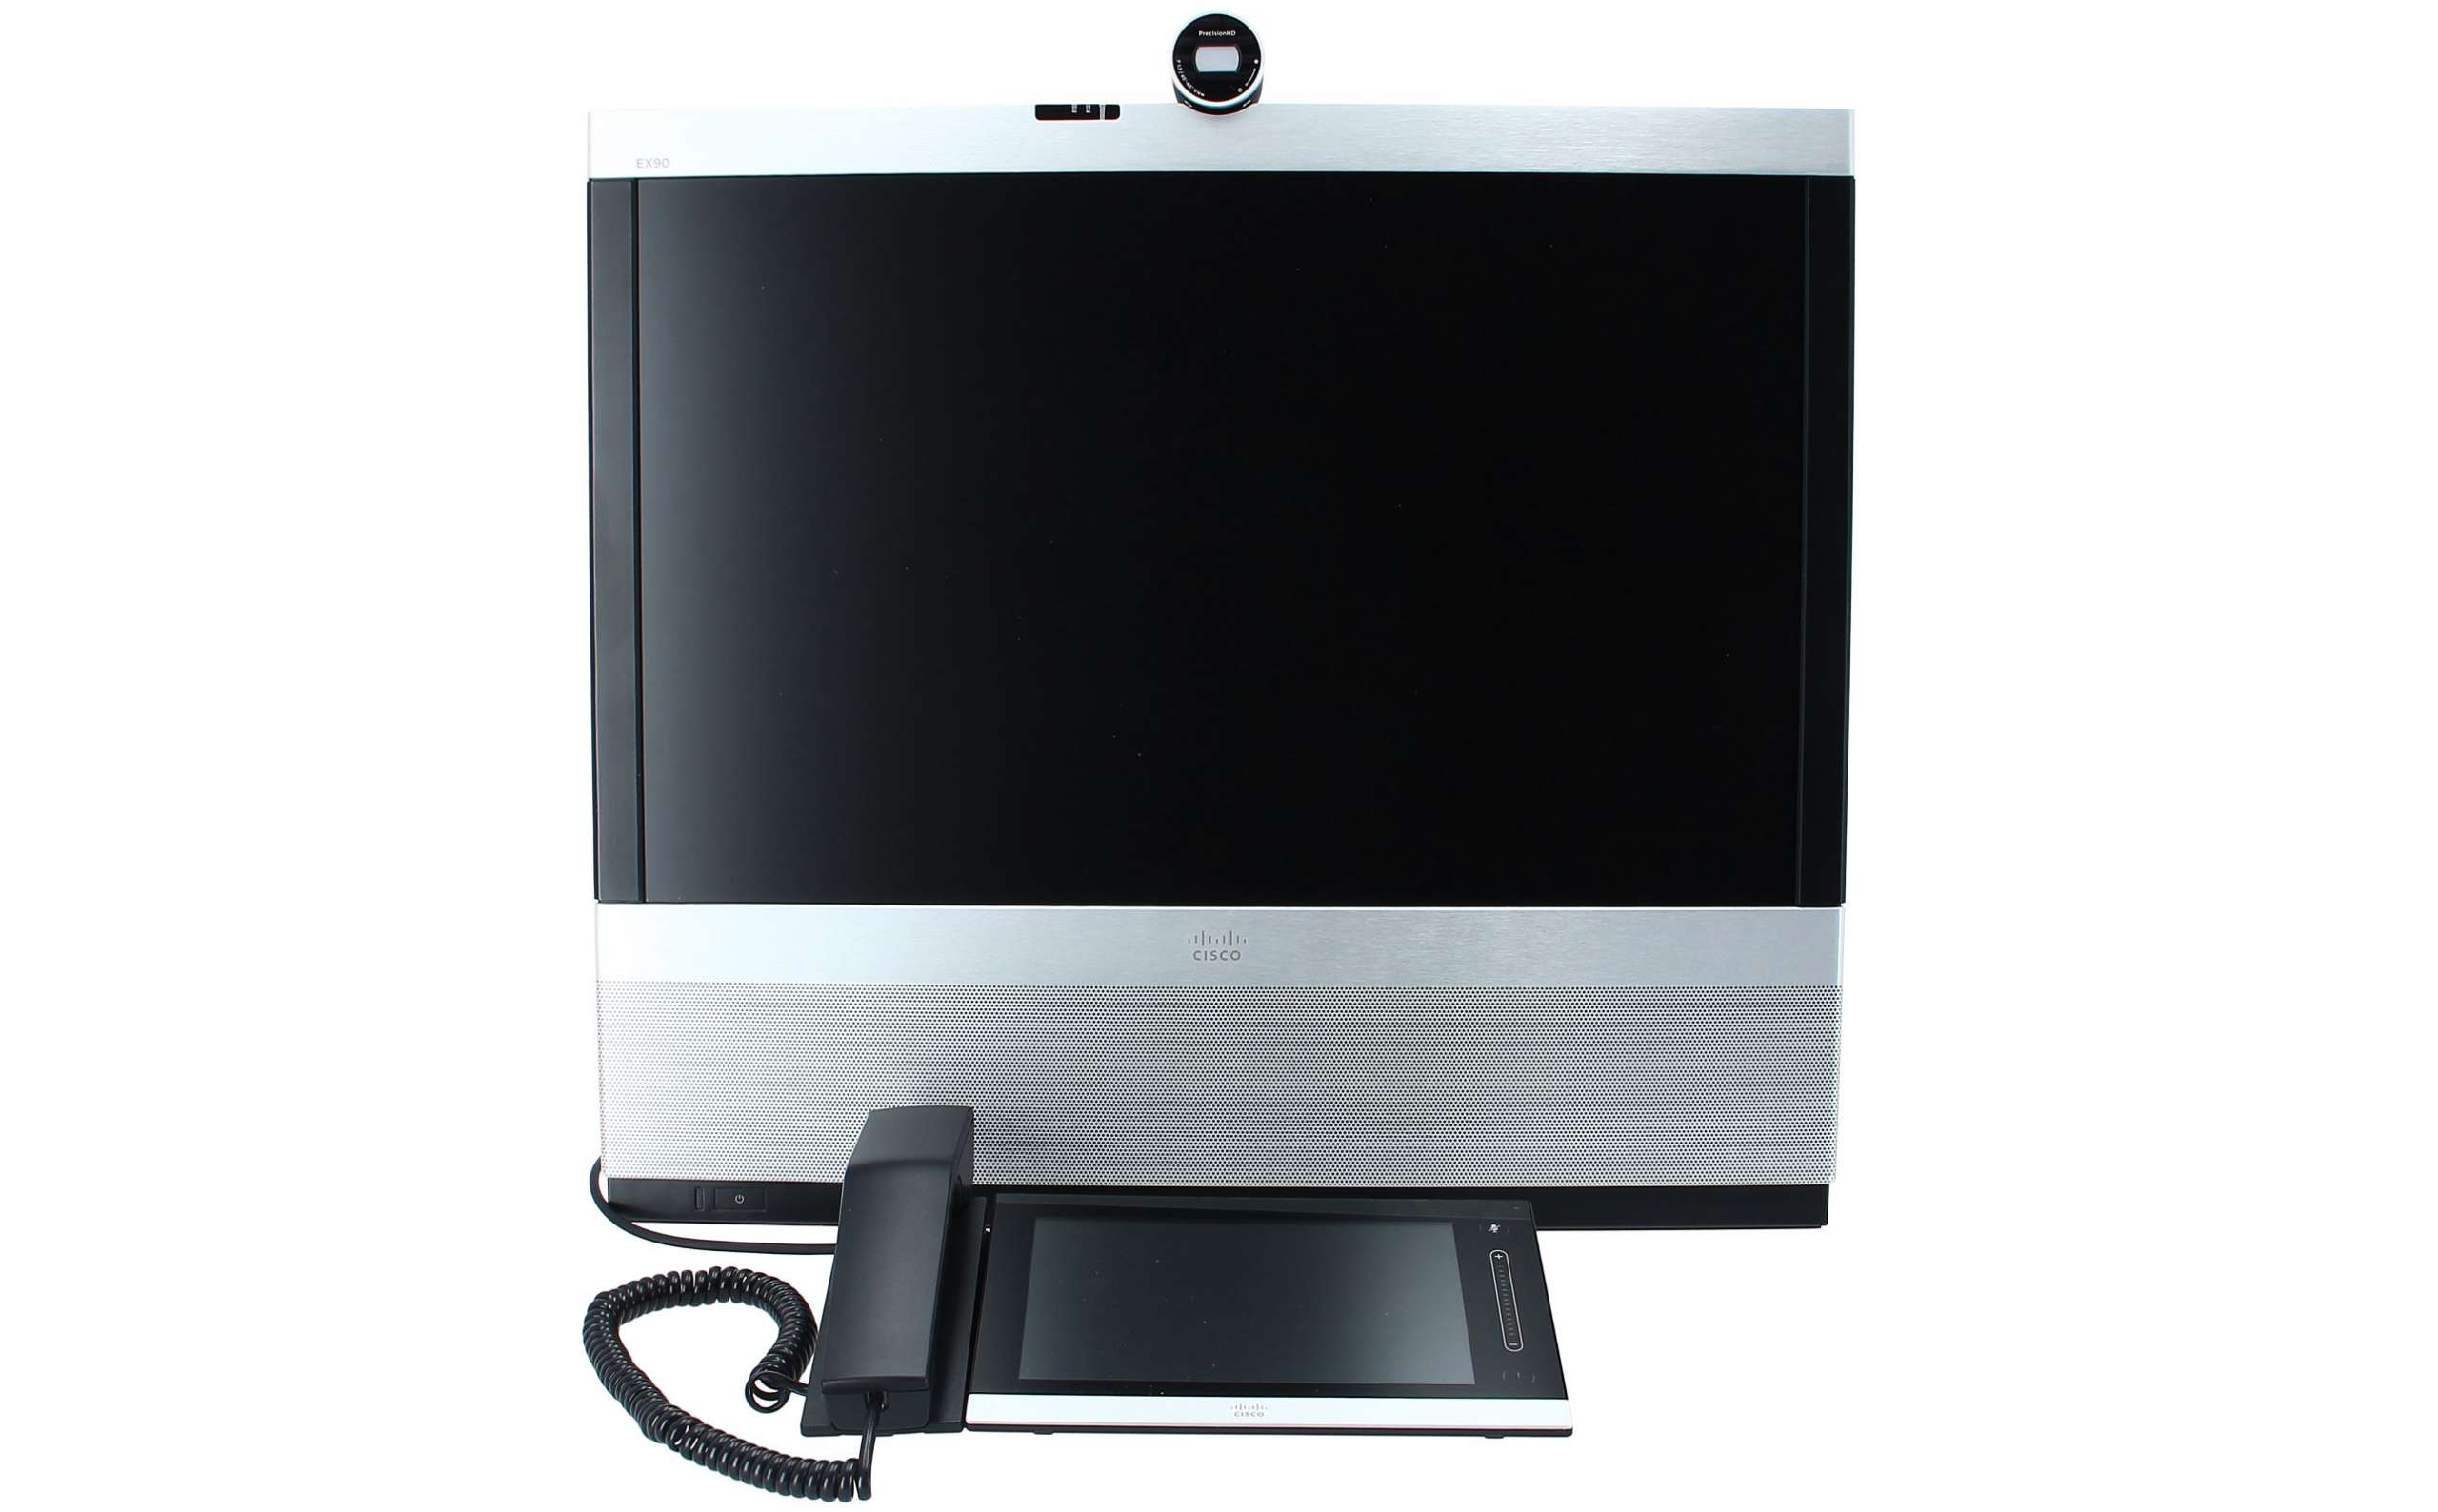 CRS 3000 POS Terminal non-backlit